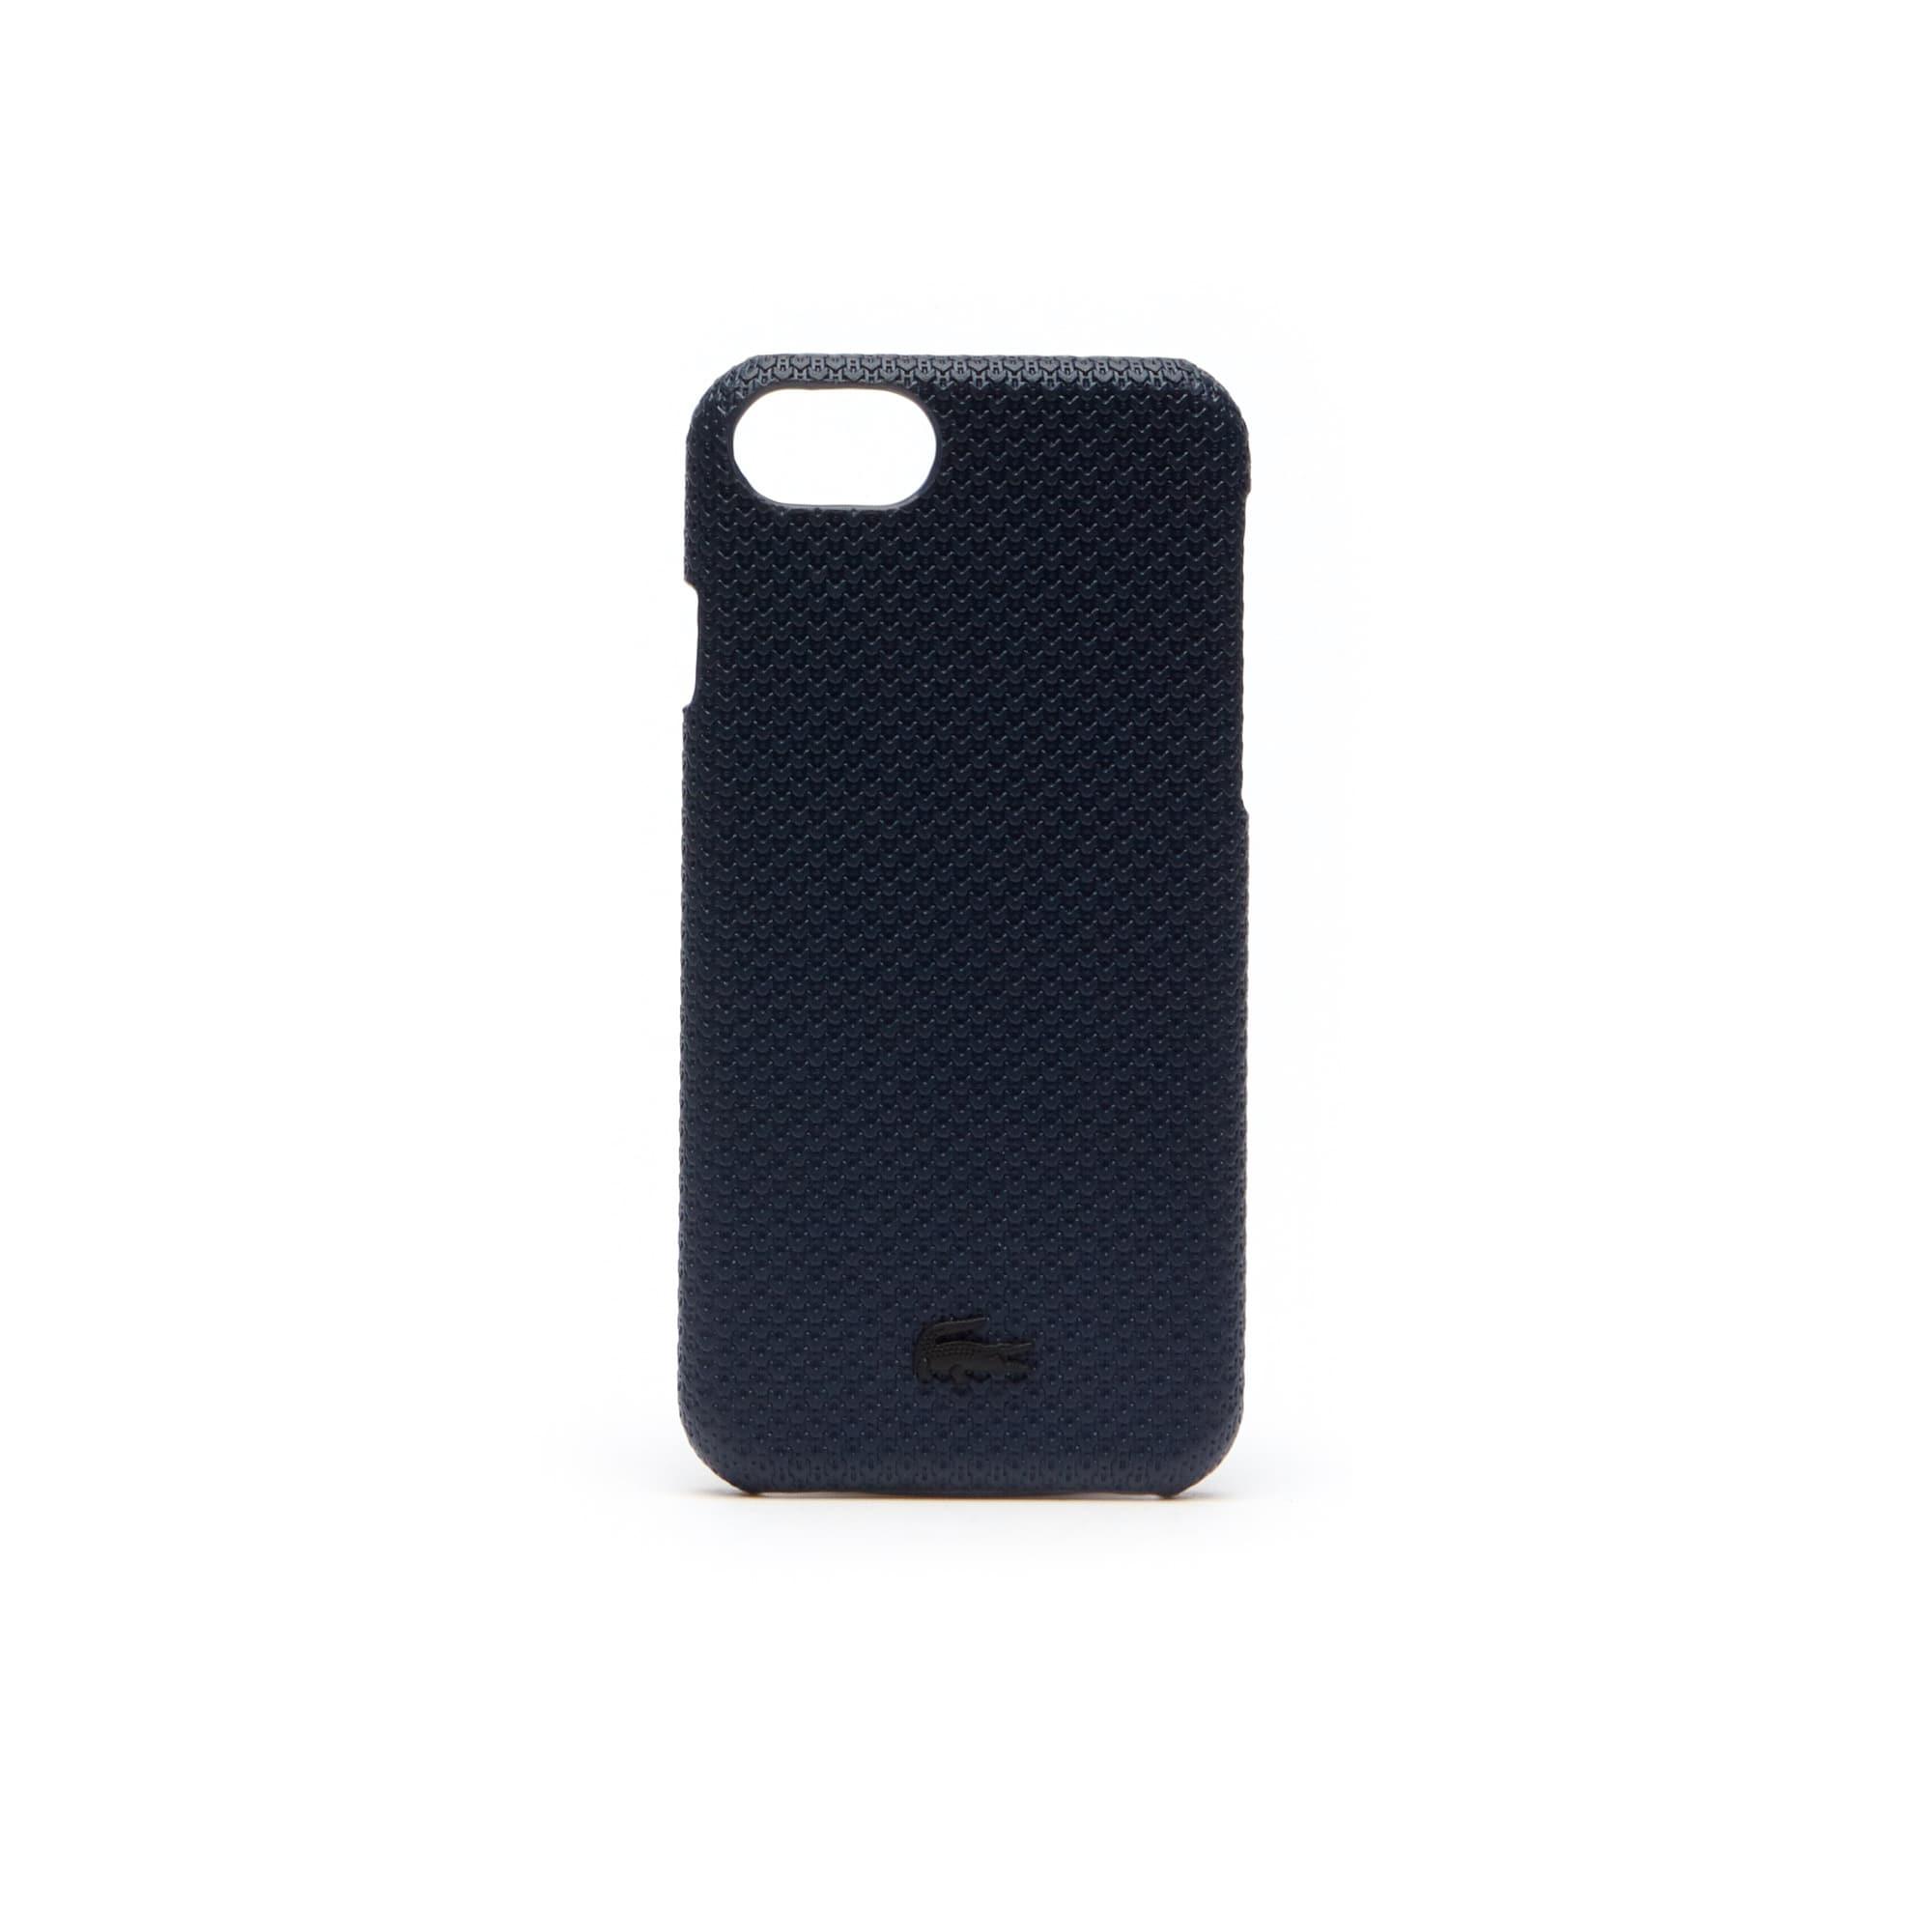 Coque iPhone 8 Chantaco en cuir piqué mat uni